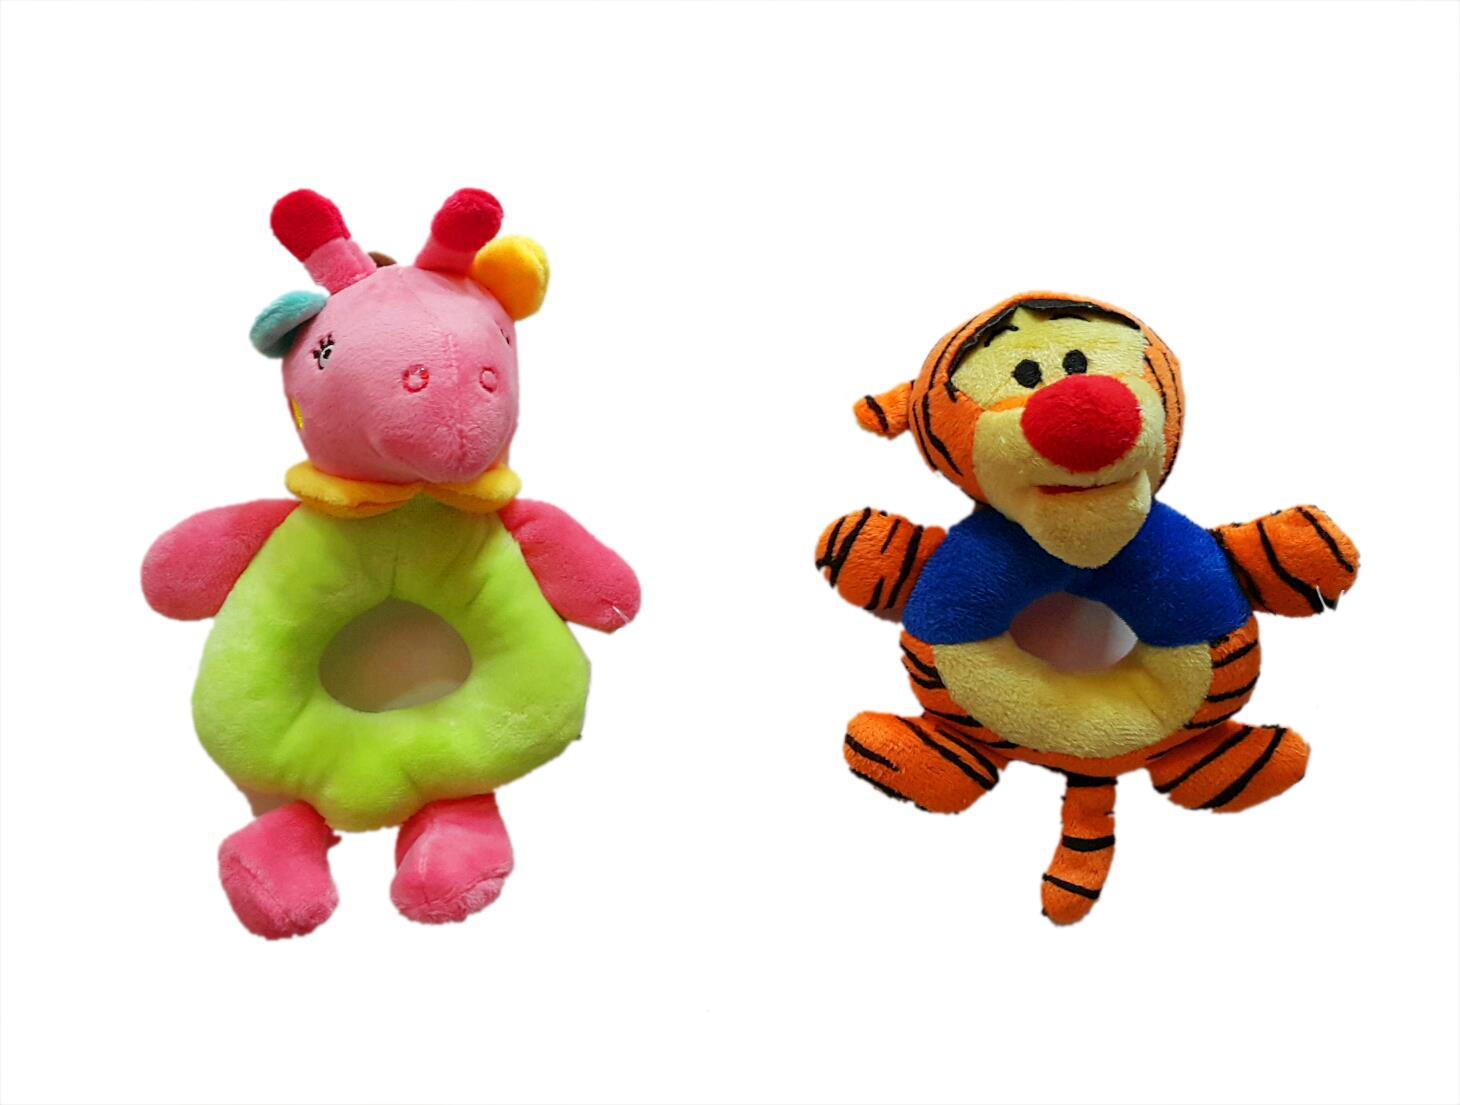 Jual Boneka Mainan Anak Rattle Stick Gelang Rattle Animals Harga Murah Jakarta oleh PT. Sarana